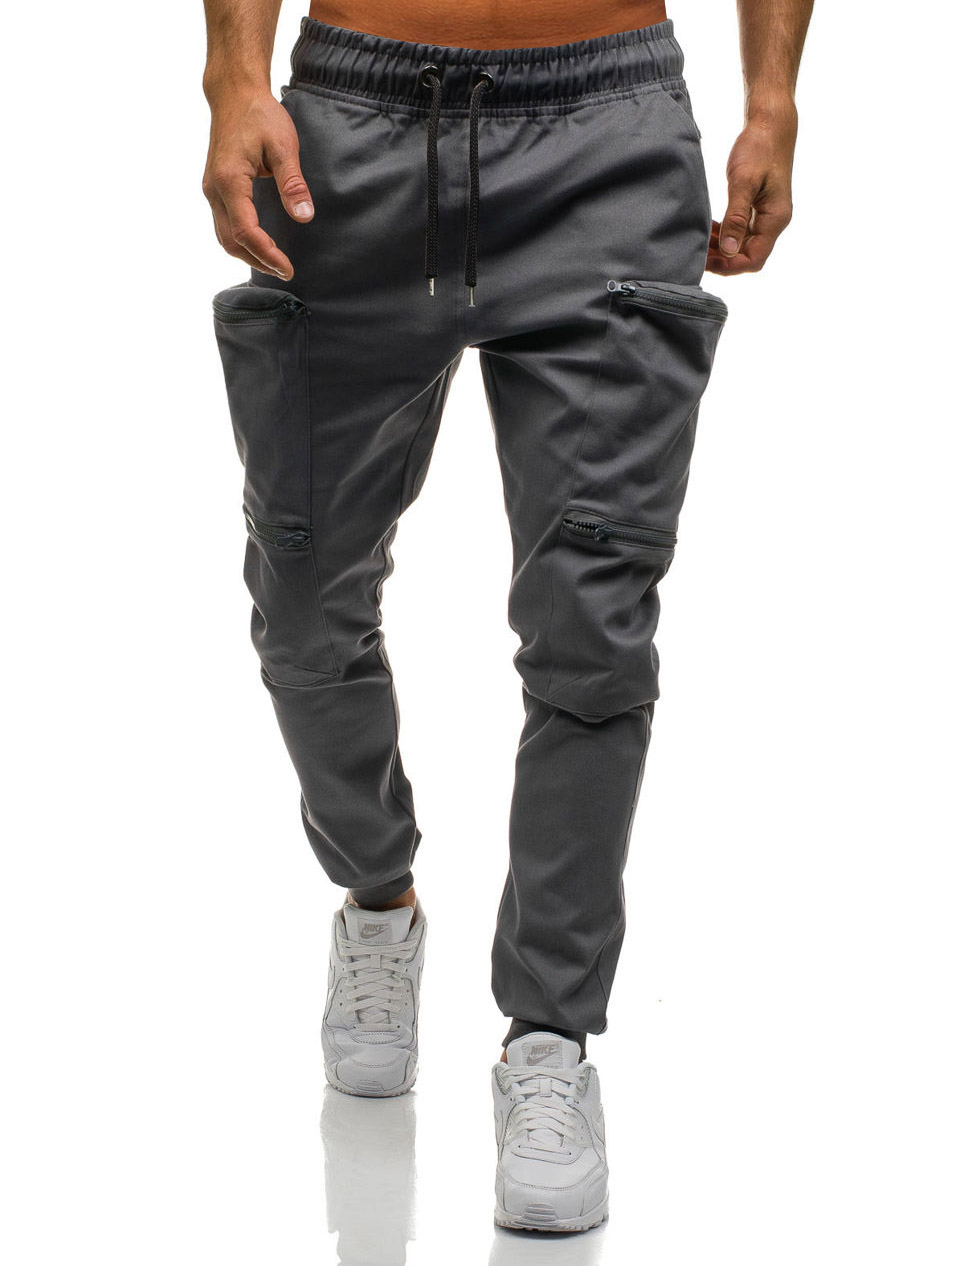 HTB1qO6eLYvpK1RjSZPiq6zmwXXaL Mens Joggers 2019 New Red Camouflage Multi-Pockets Cargo Pants Men Cotton Harem Pants Hip Hop Trousers Streetwear XXXL